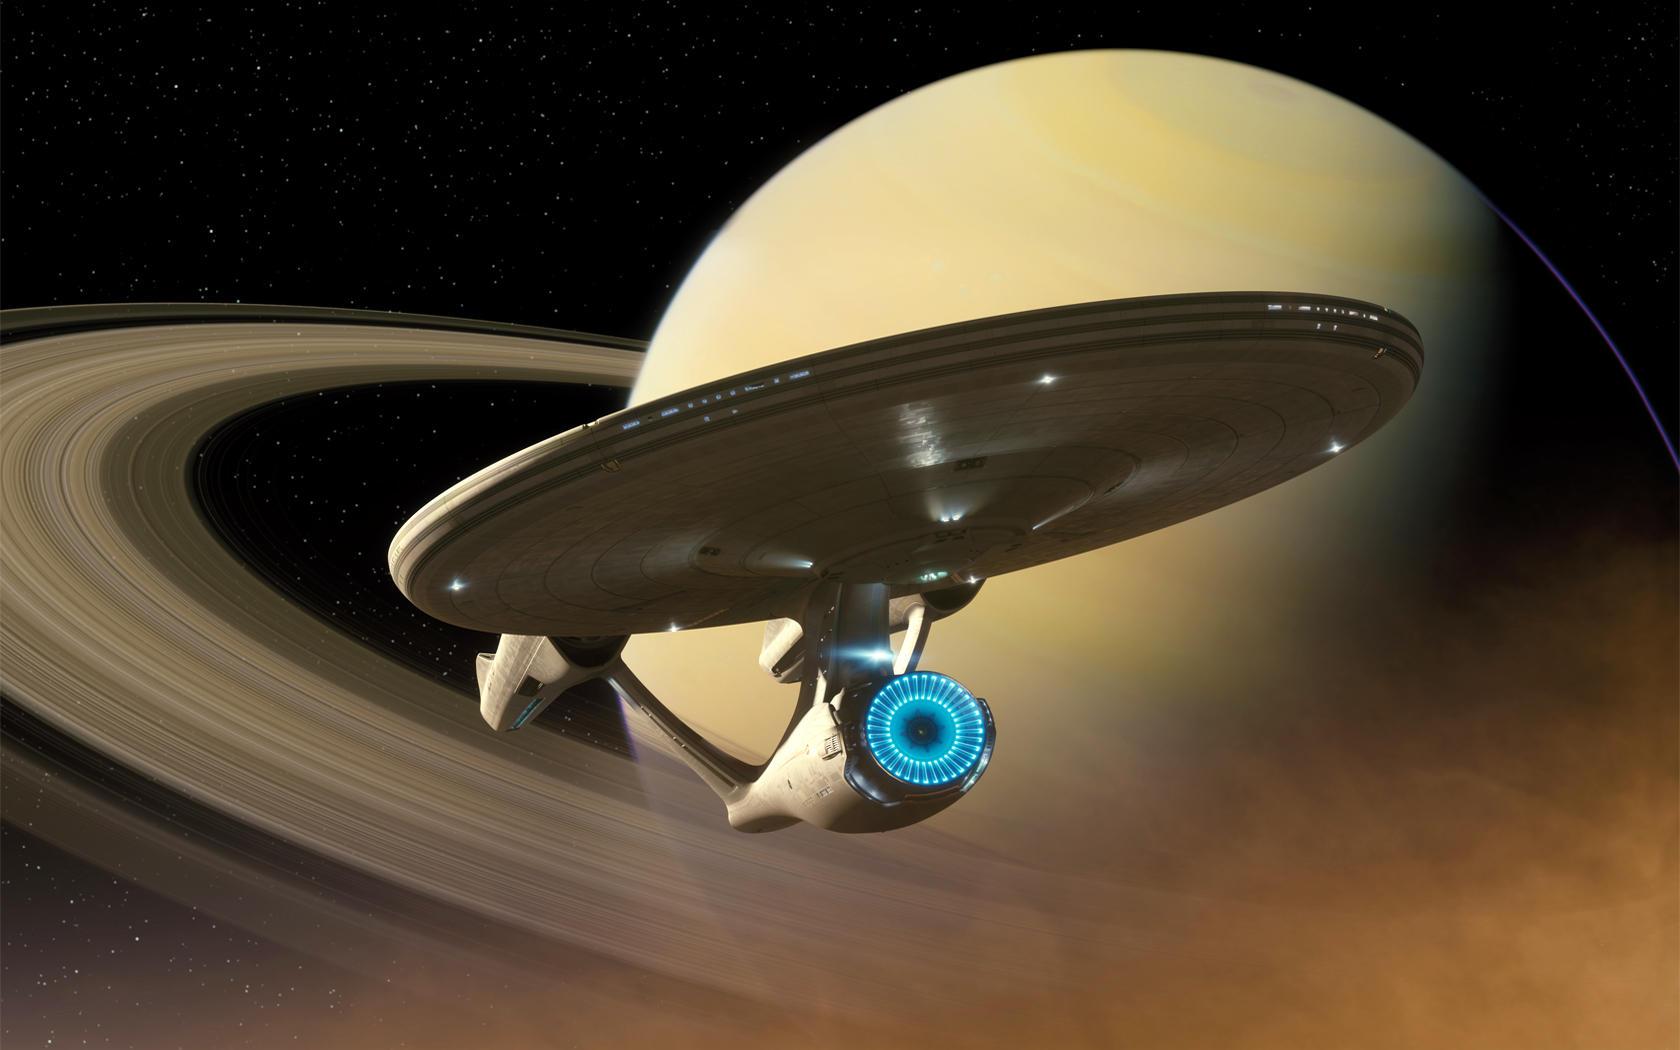 Star Trek 2009 - Enterprise by Dannydeman